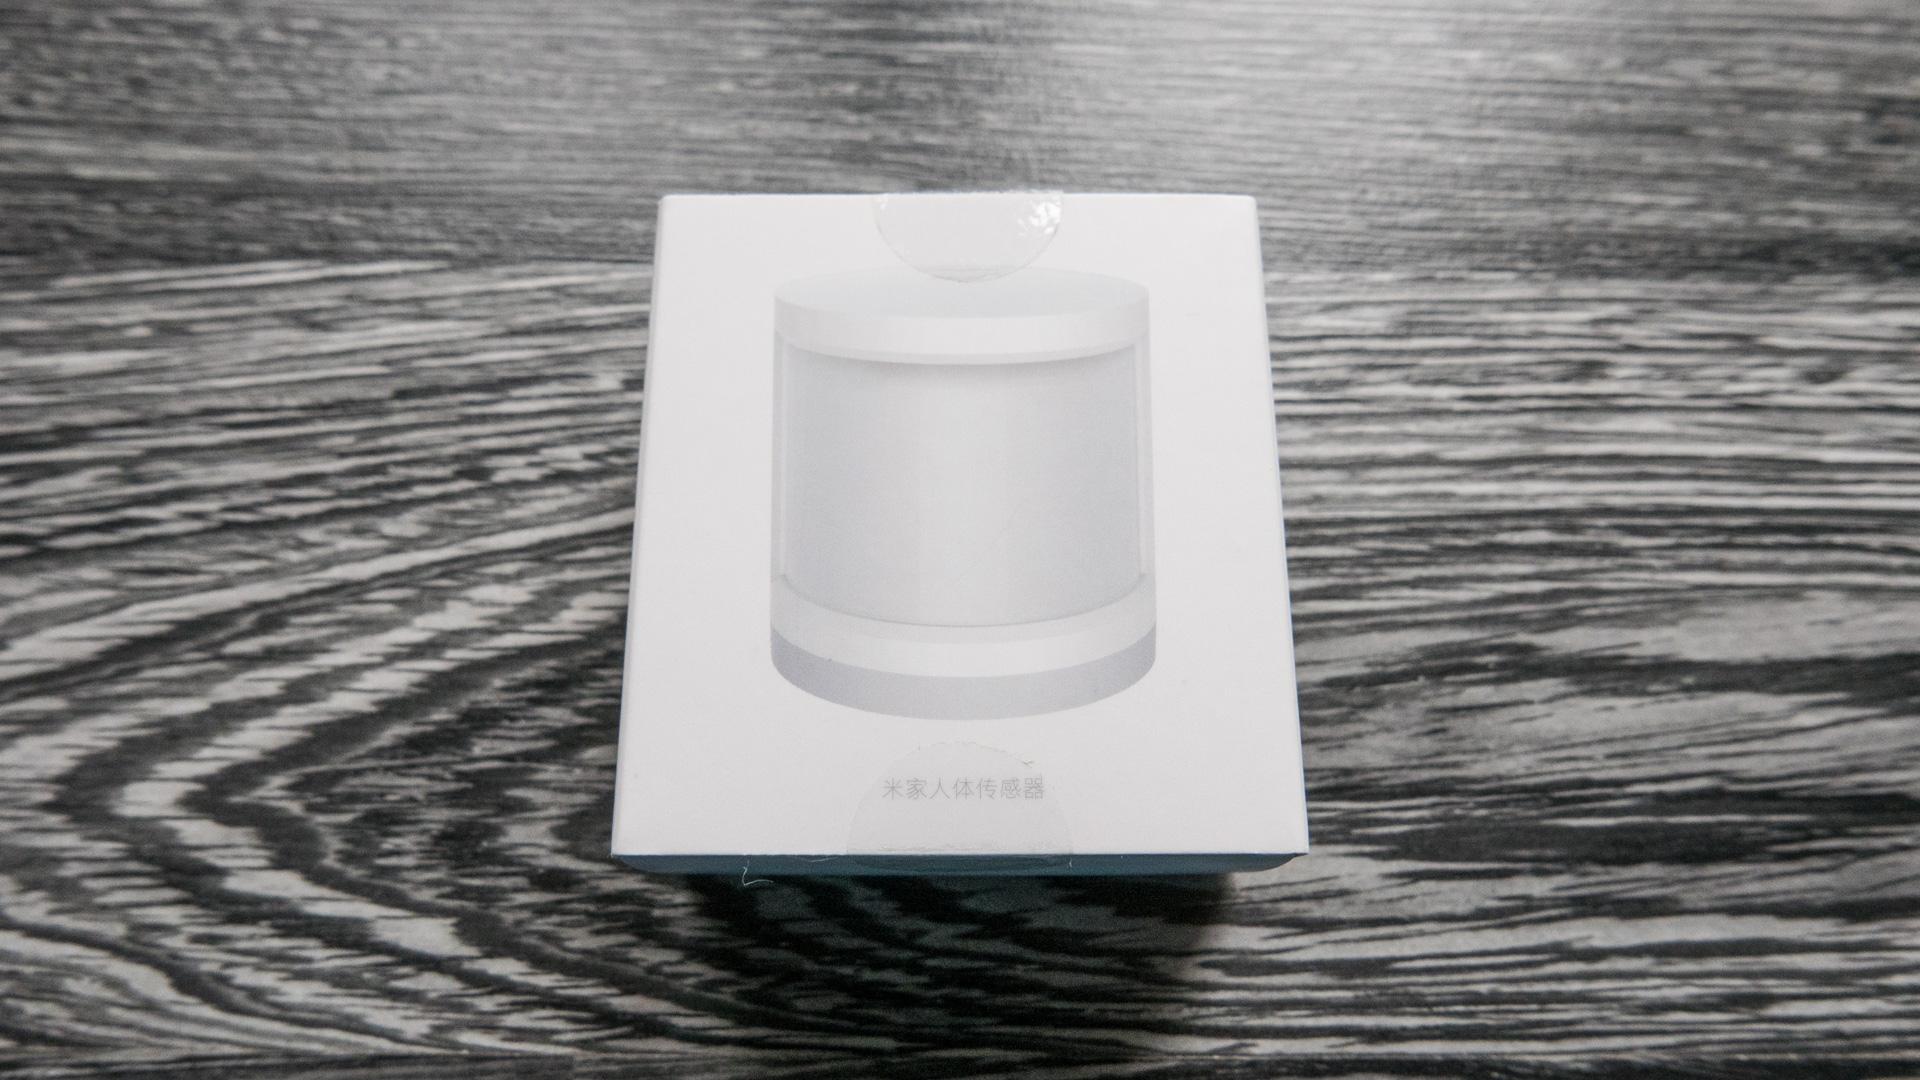 Xiaomi Mi Home Bewegungsmelder 01